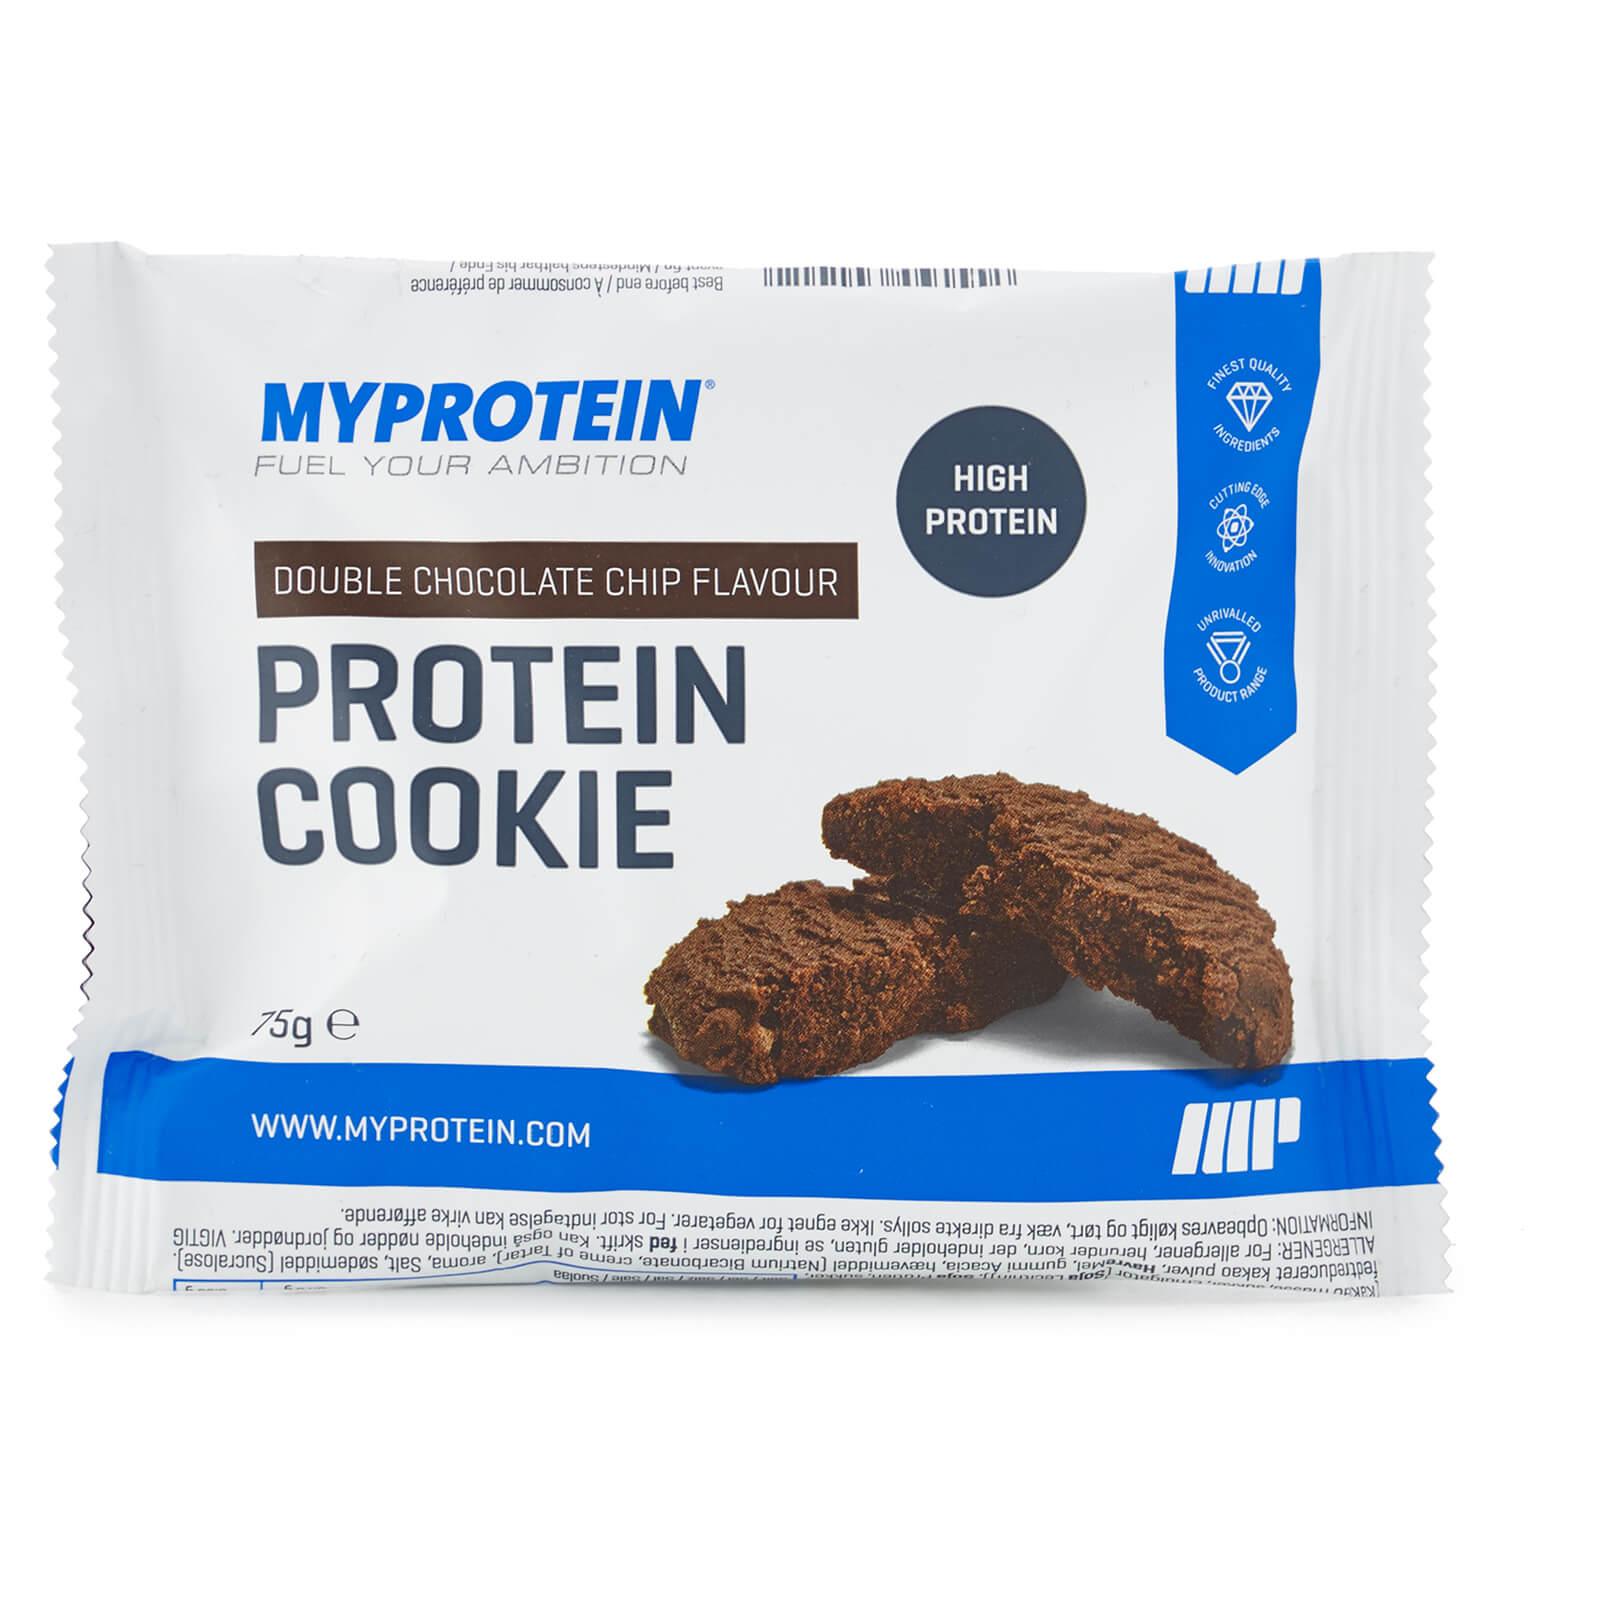 Myprotein Cookie protéiné (échantillon) - 75g - Double chocolat